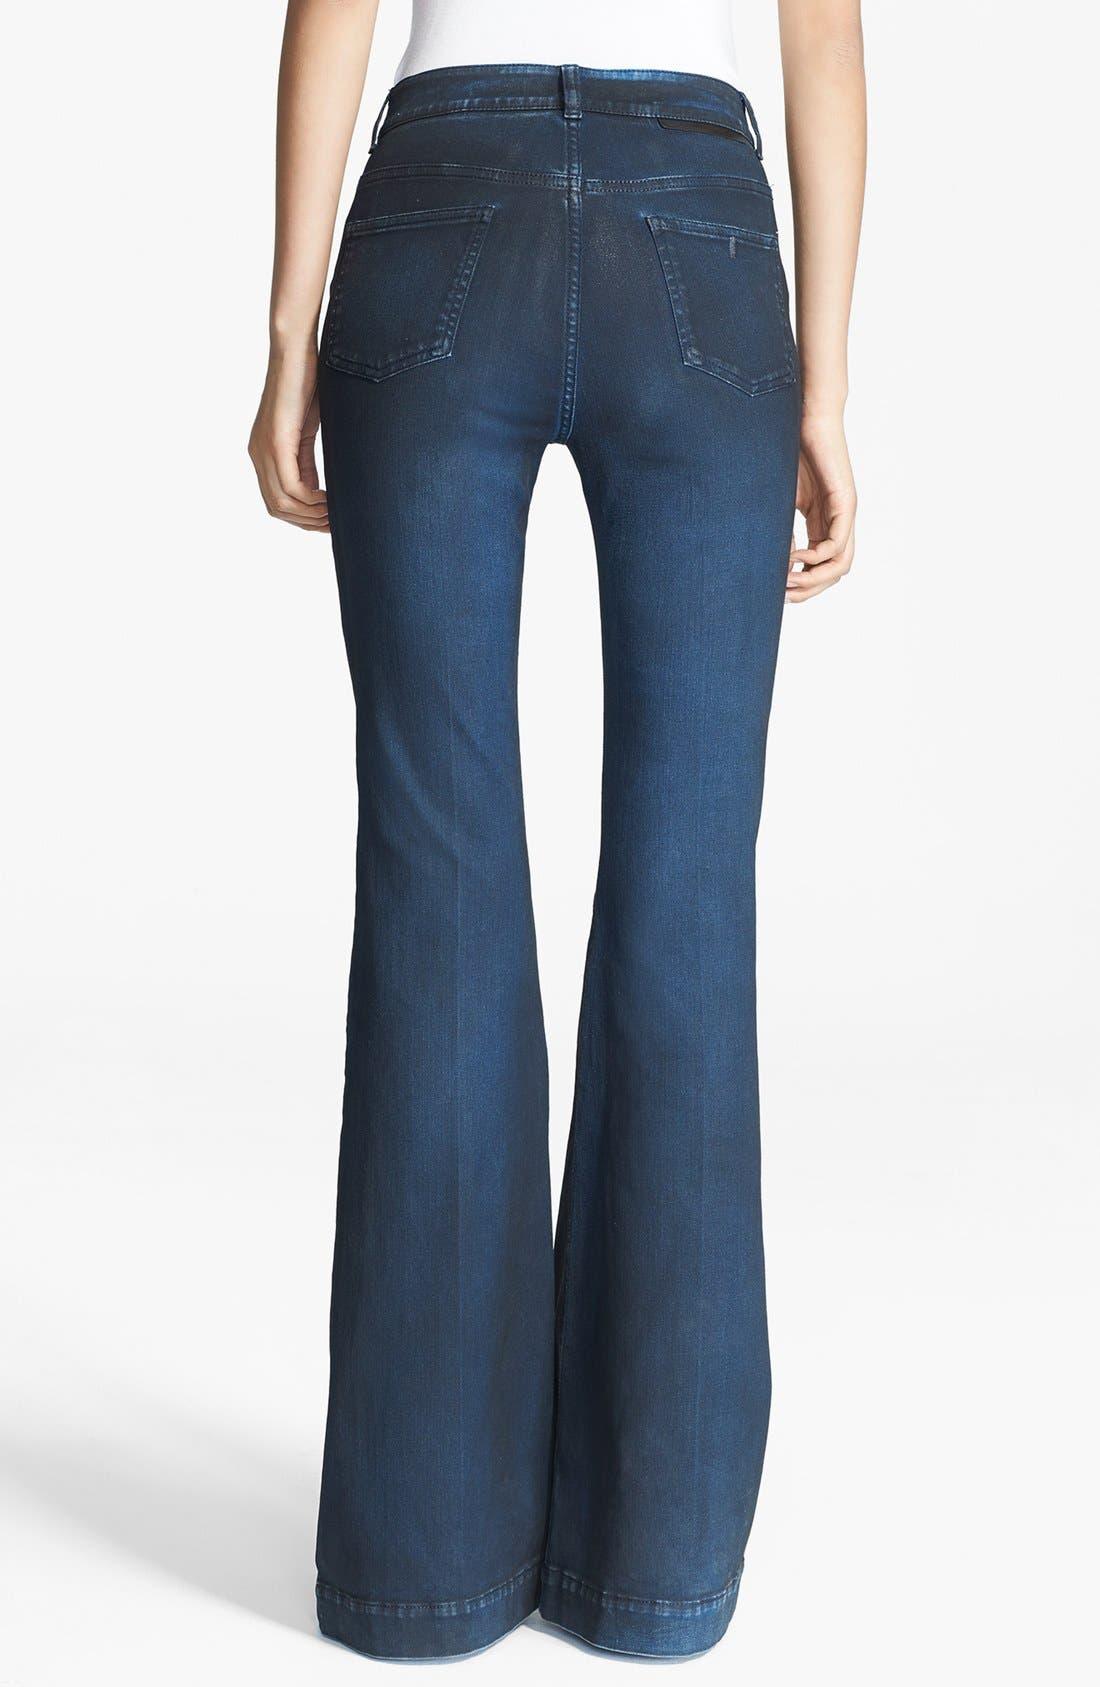 Alternate Image 2  - Stella McCartney 'The 70's Flare' Jeans